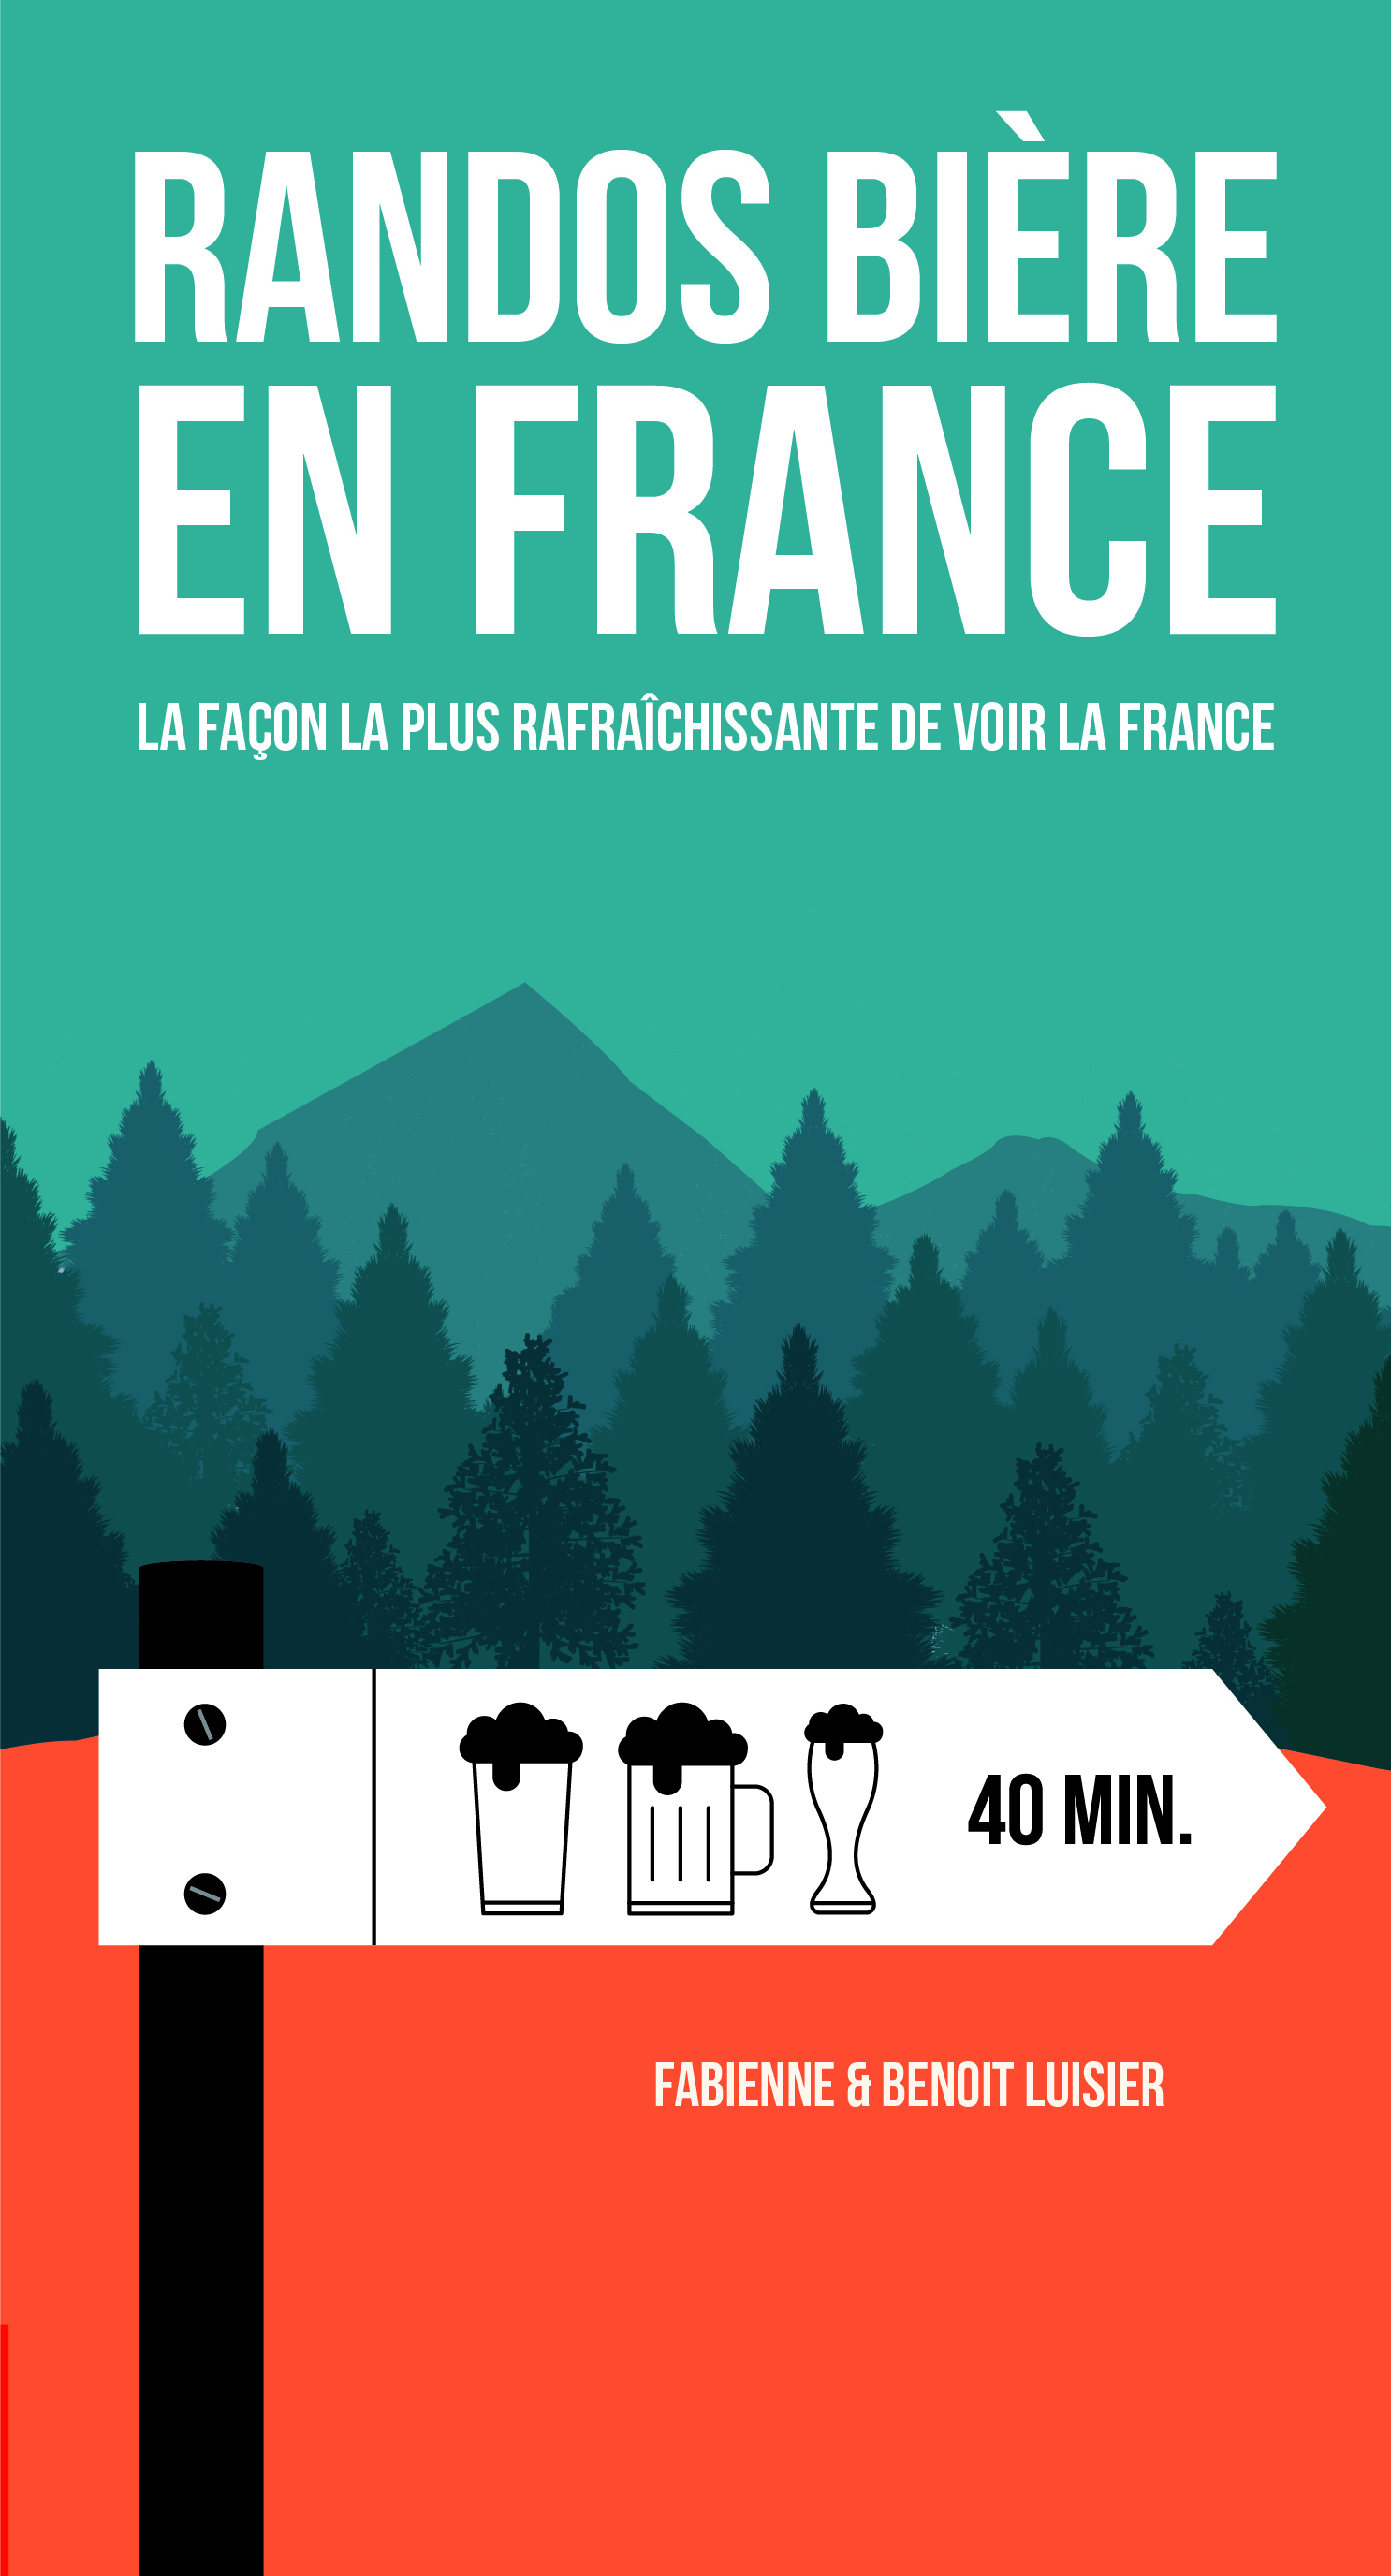 beer hiking in France